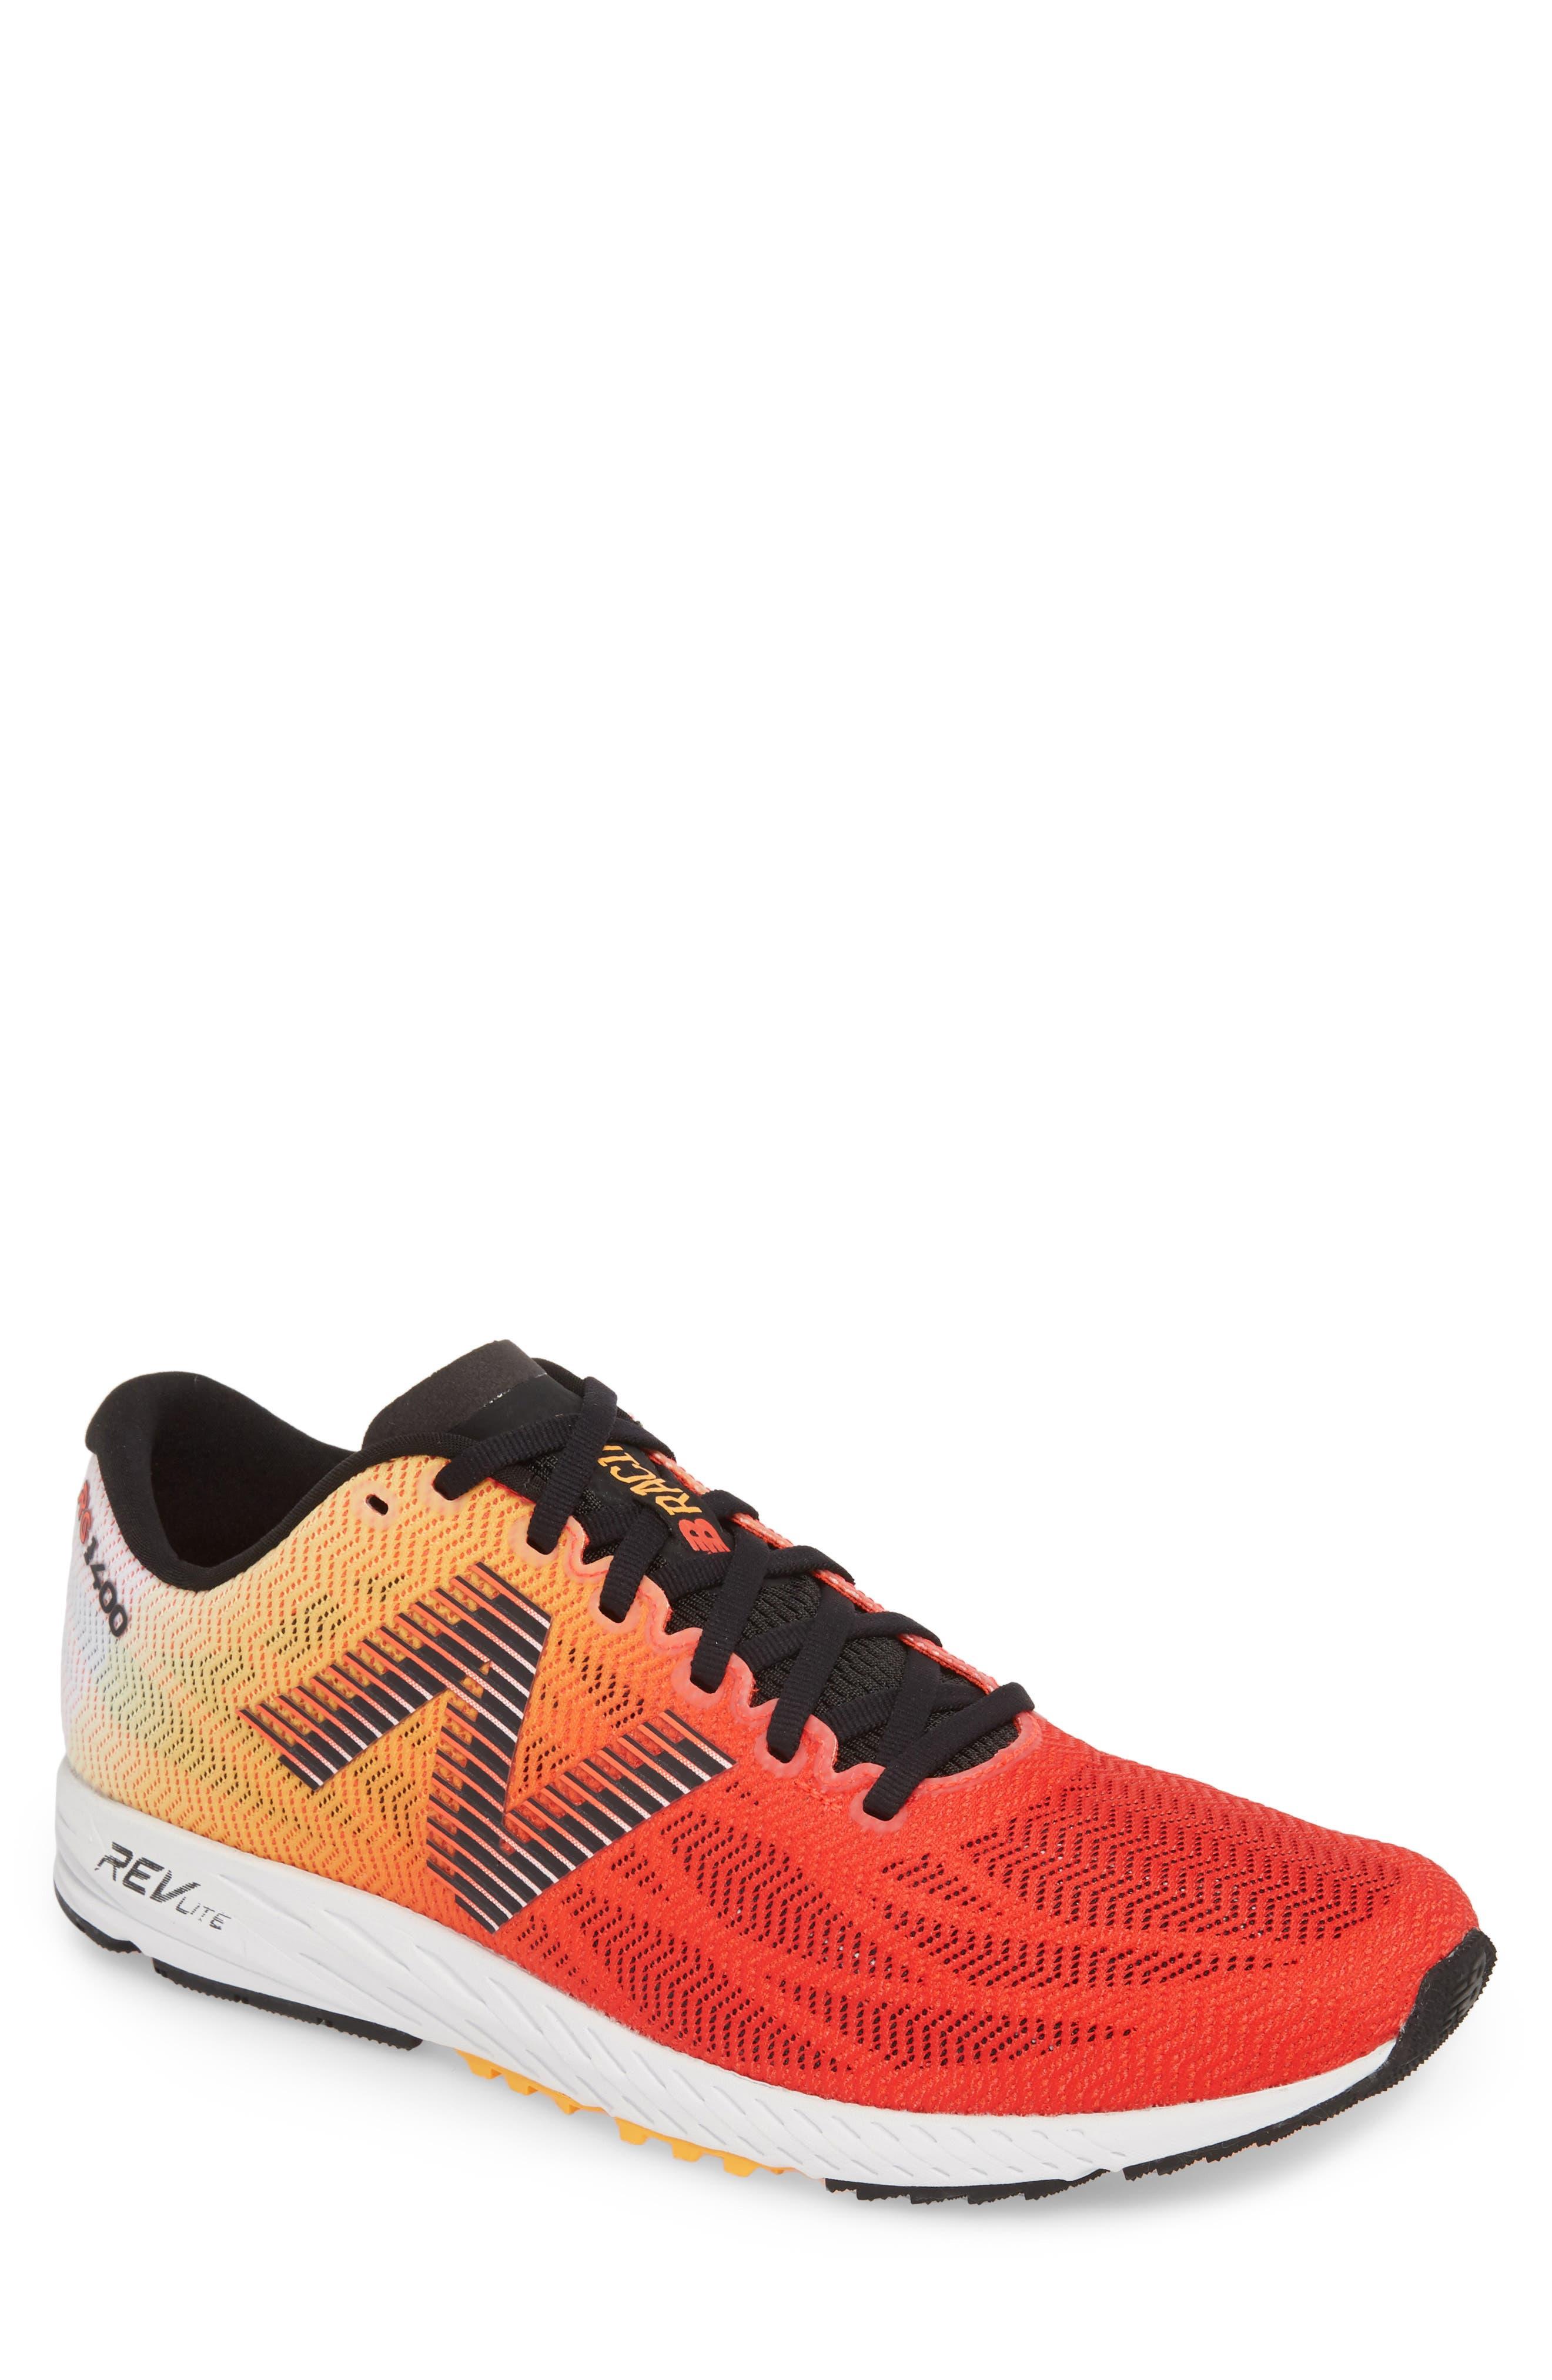 1400v6 Running Shoe,                             Main thumbnail 1, color,                             White Munsell